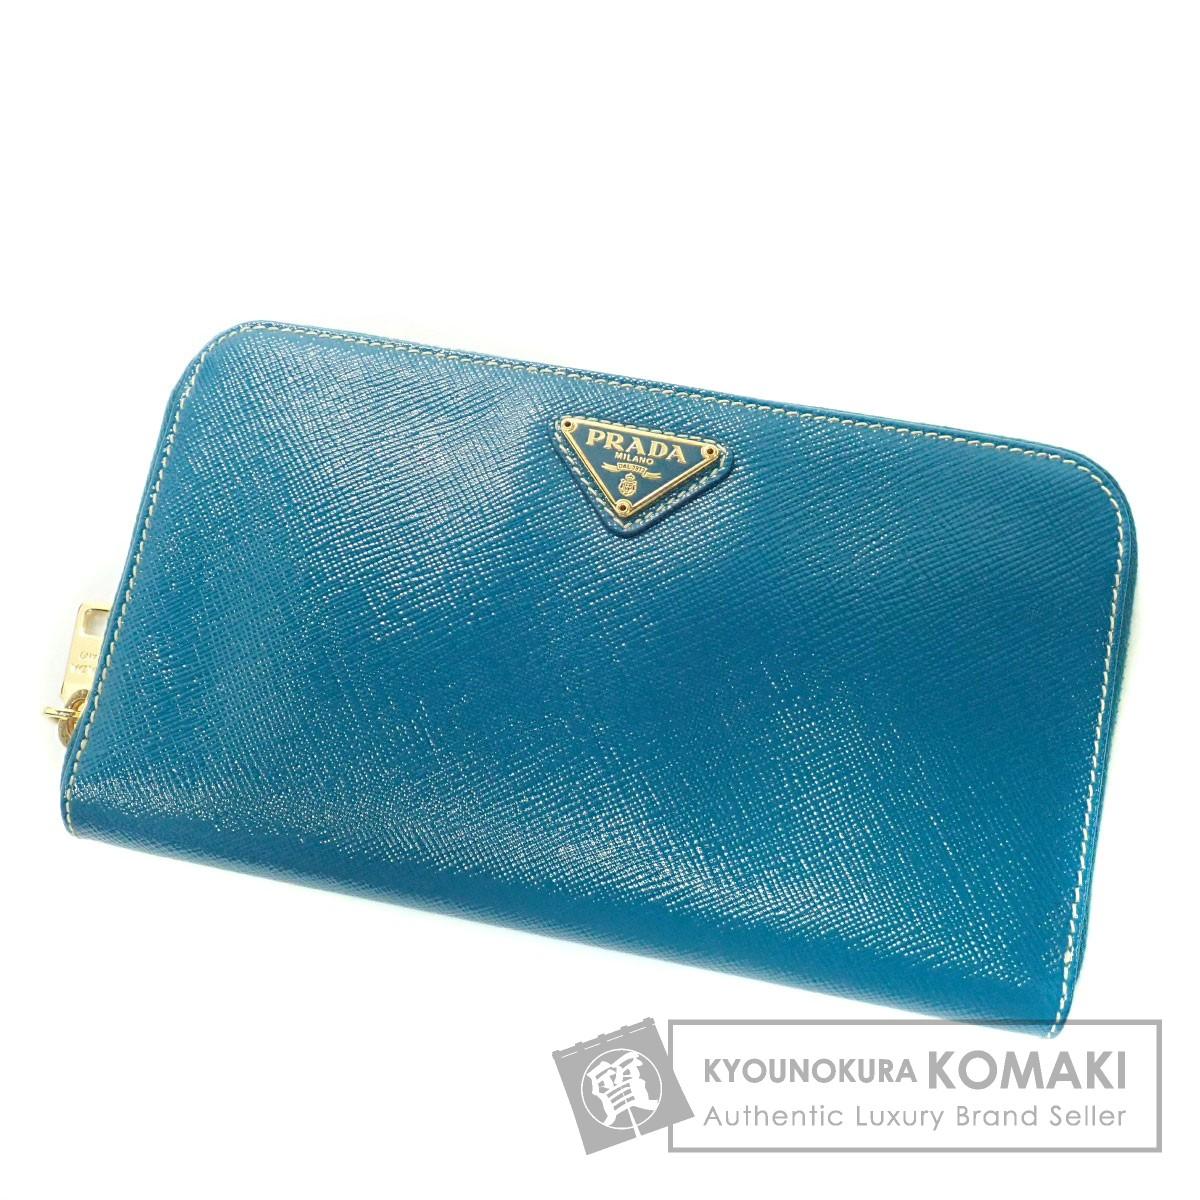 PRADA ロゴマーク 長財布(小銭入れあり) PVC レディース 【中古】【プラダ】